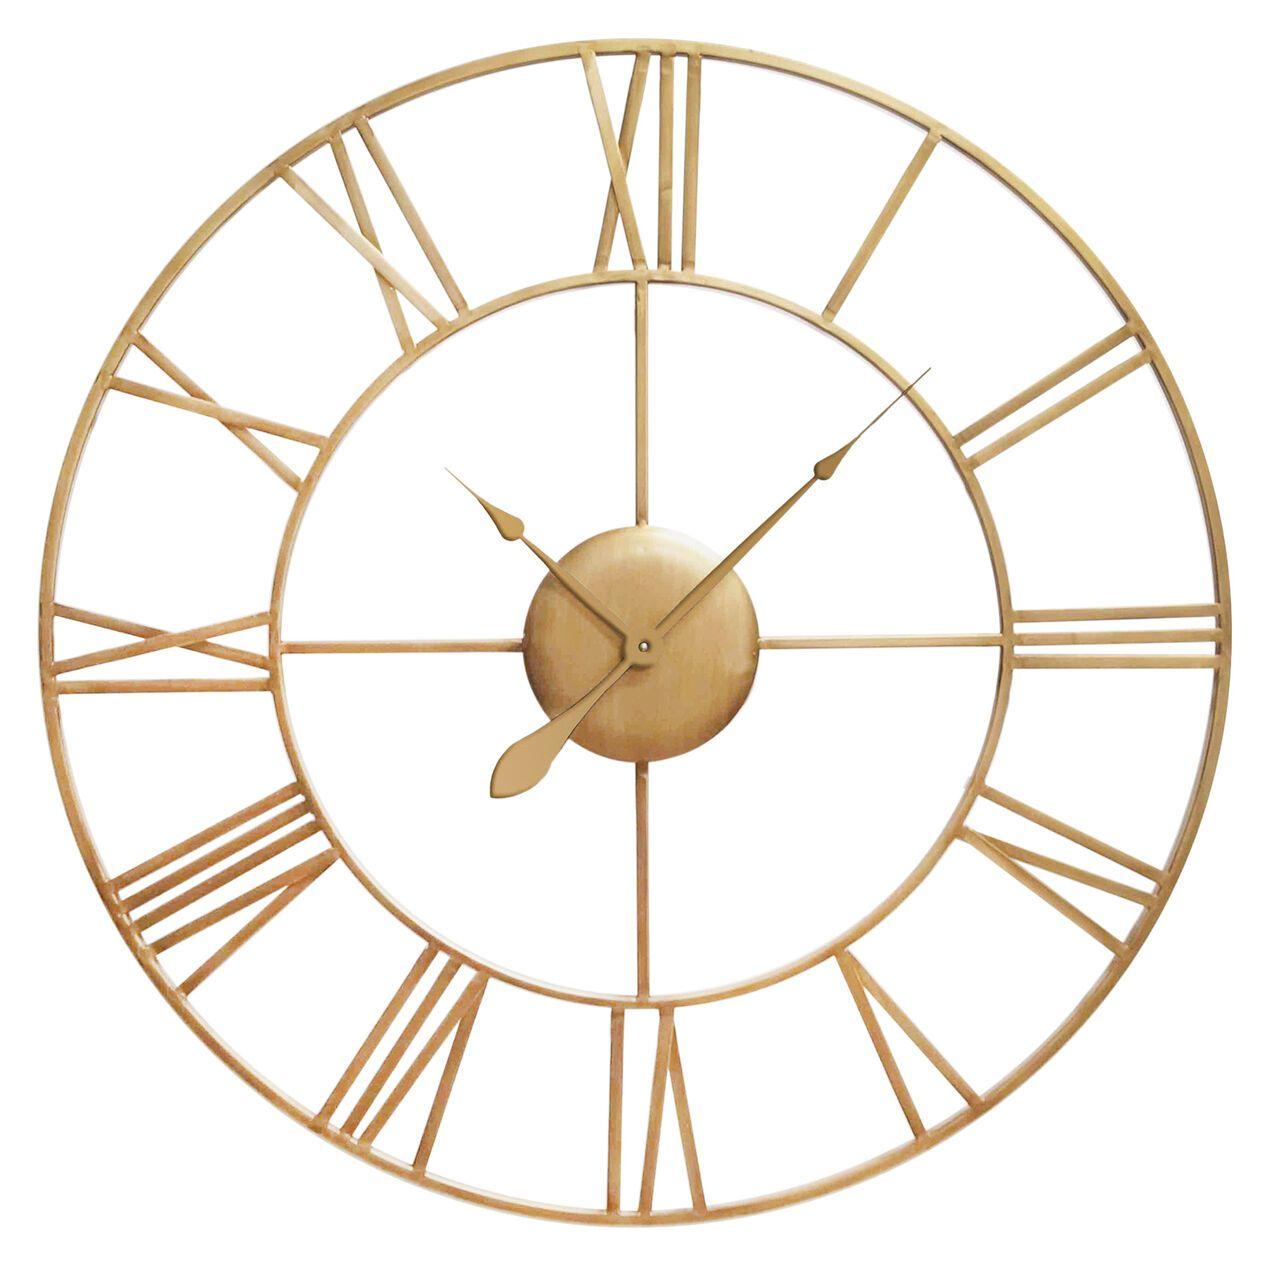 Hampton Brass Metal Wall Clock 41 At Home Metal Clock Wall Clock Wall Clocks Living Room Large gold wall clock